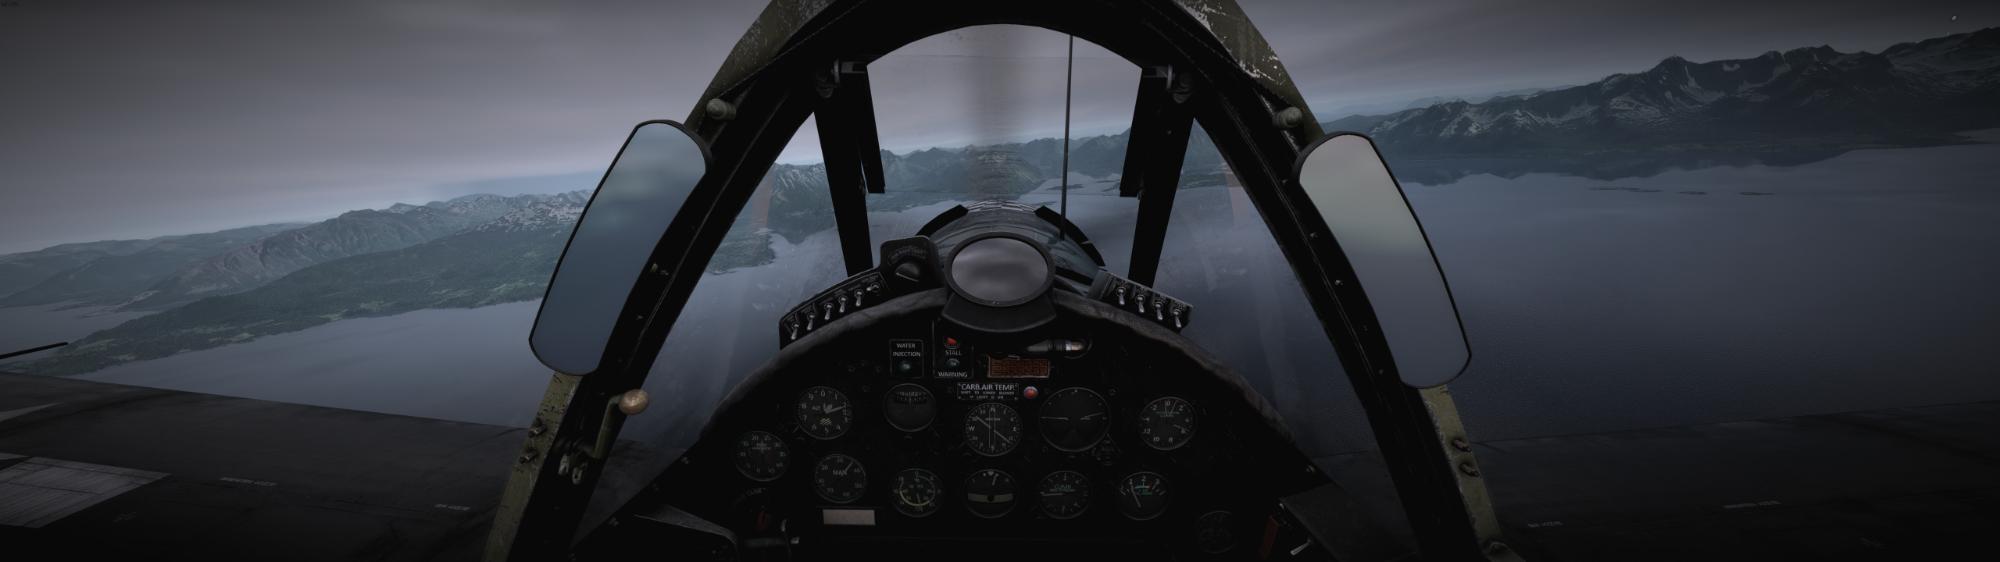 Microsoft Flight Simulator - 1.18.15.0 9_2_2021 7_37_10 PM.png